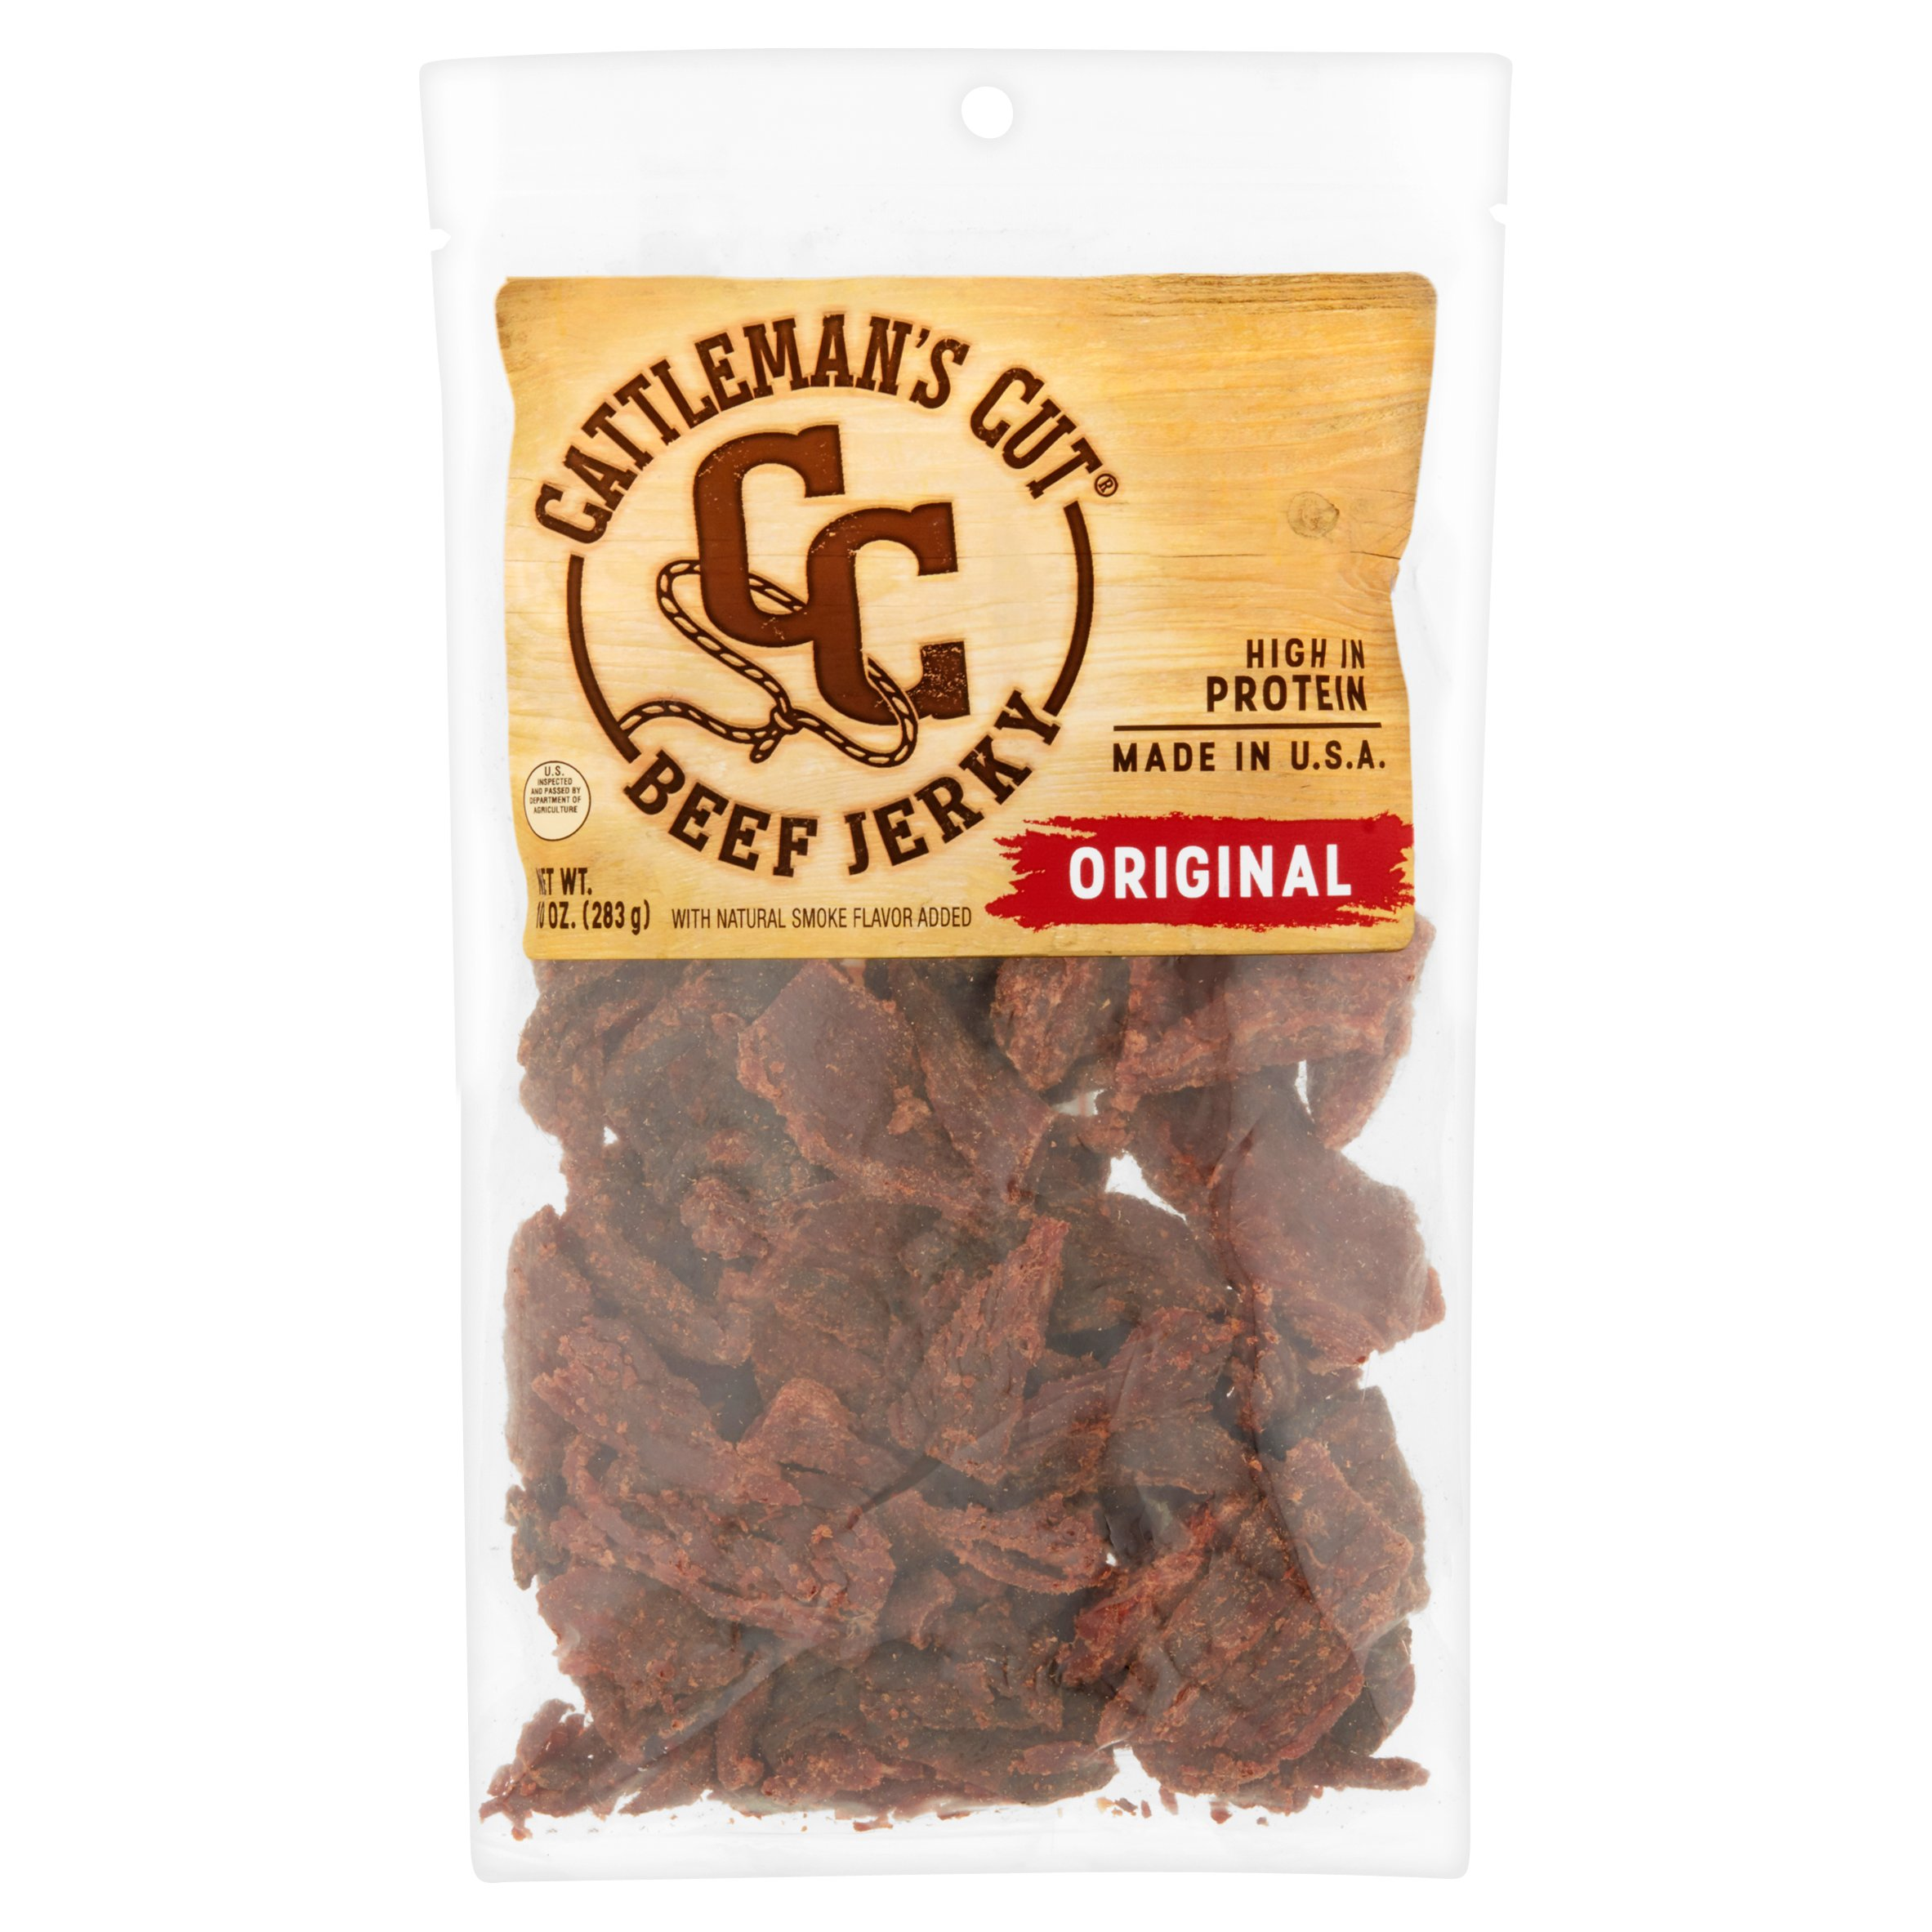 Cattleman's Cut Original Beef Jerky, 10 oz by Oberto Brands